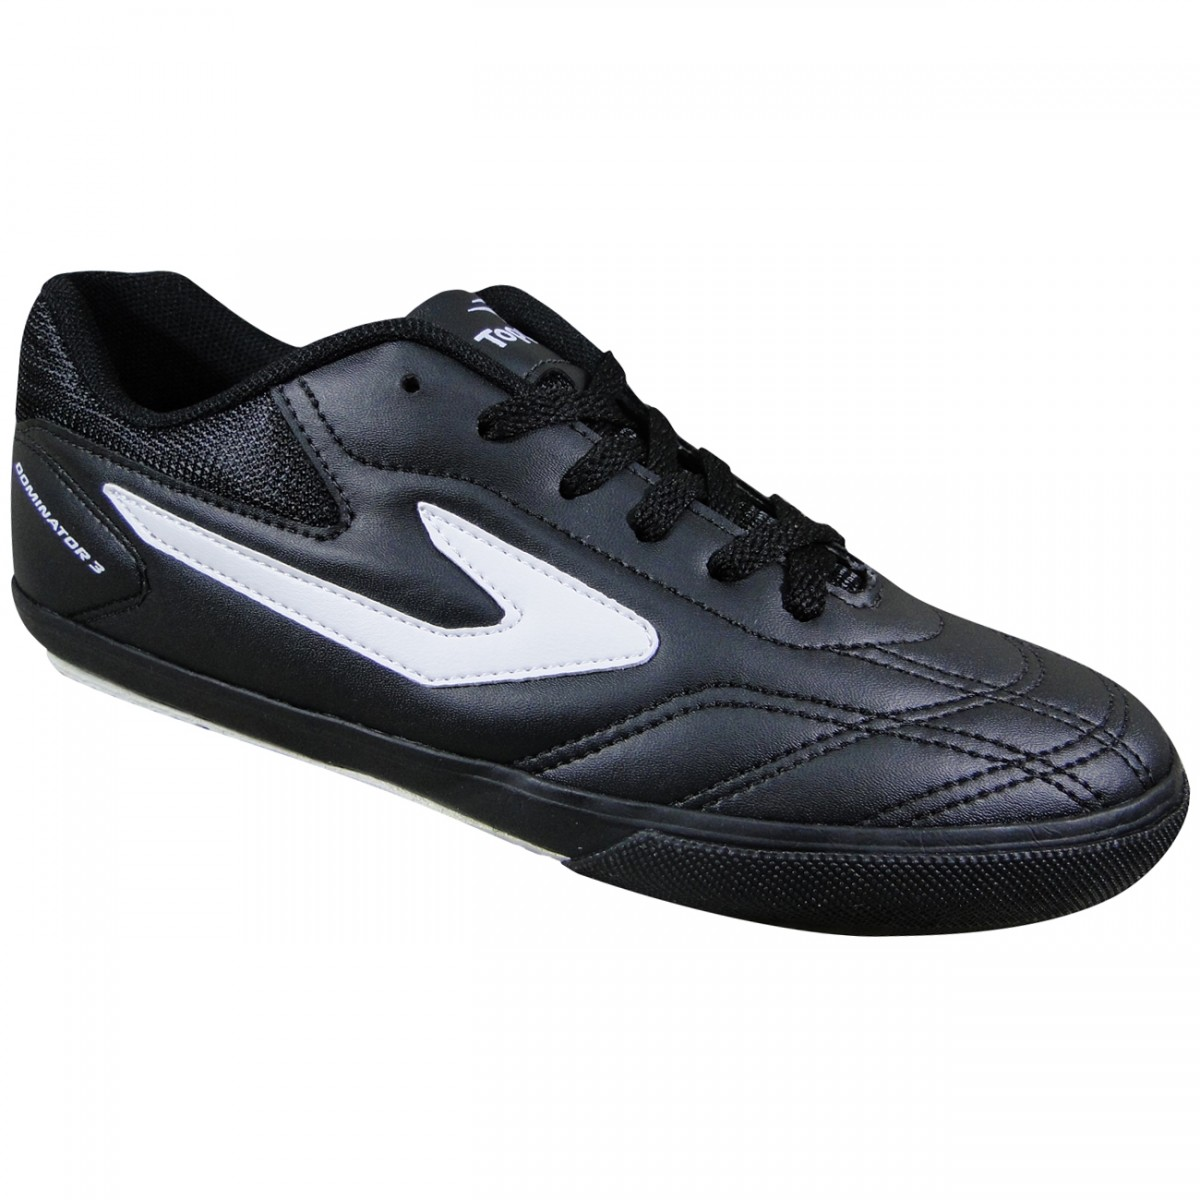 4e8b9c1649e Tenis Topper Dominator III Futsal 4132751 133 - Preto Branco - Chuteira  Nike